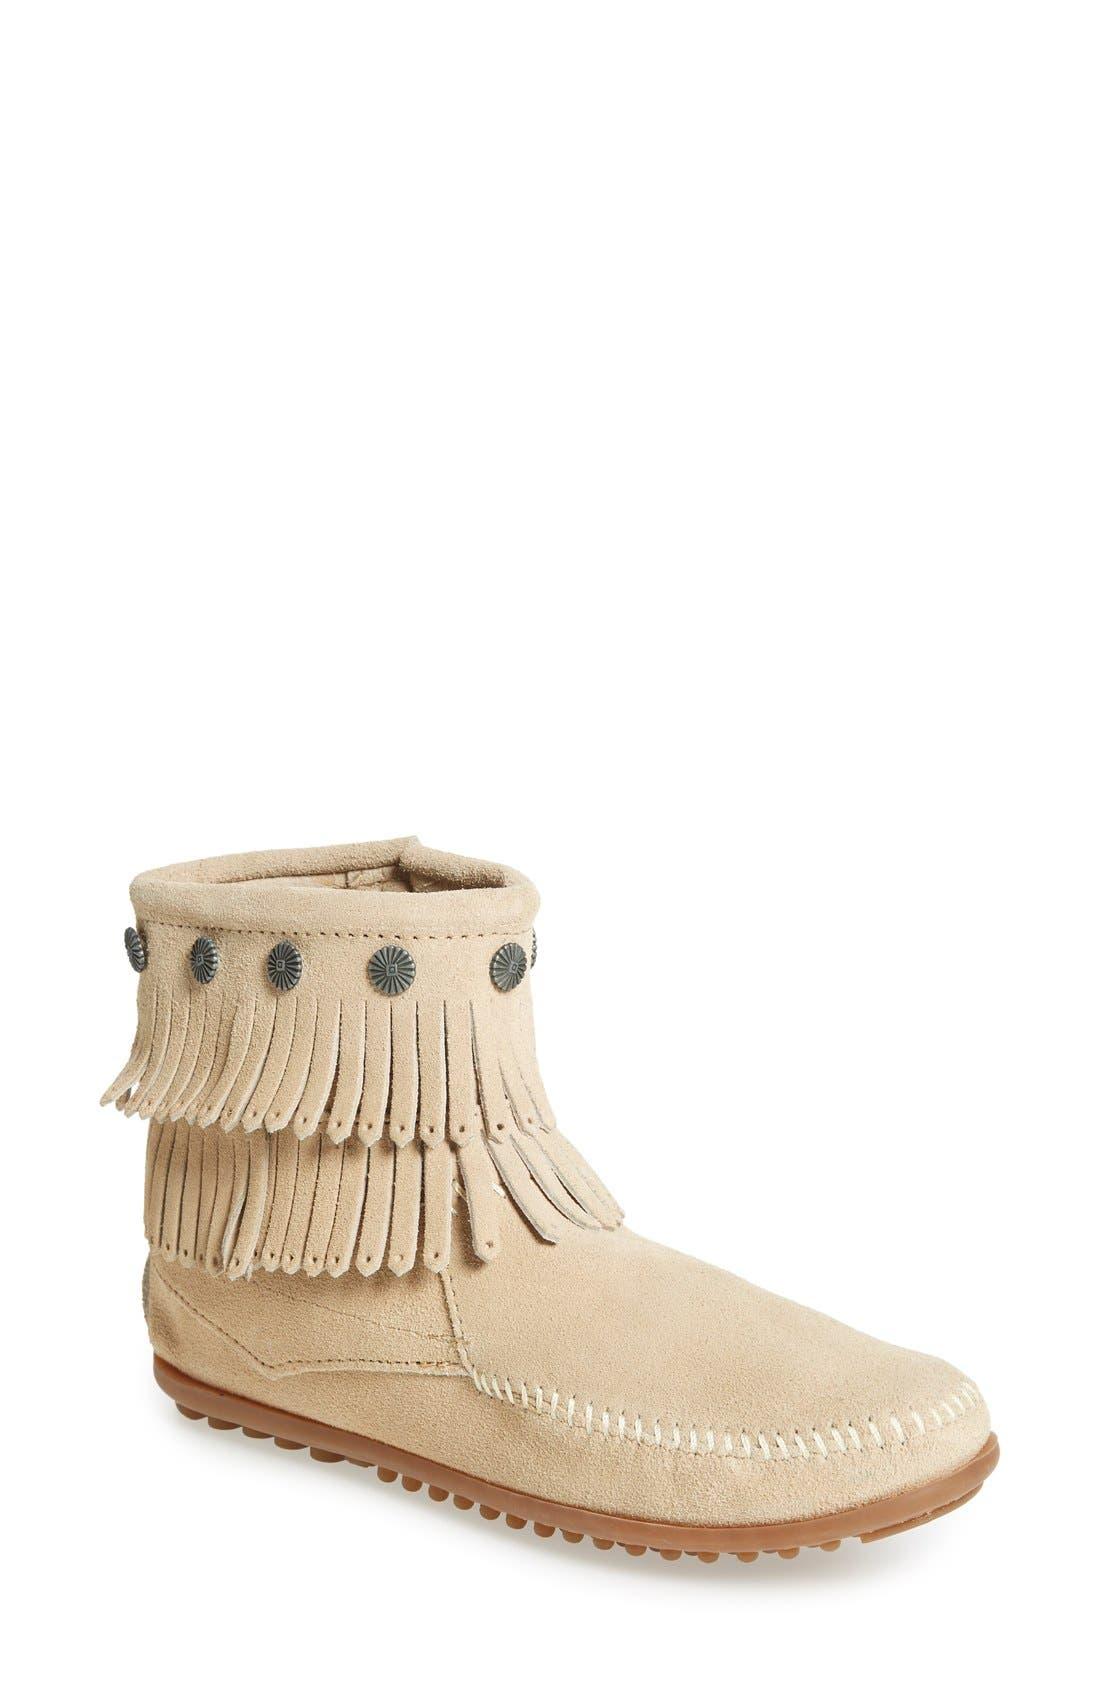 MINNETONKA Double Fringe Boot, Main, color, STONE SUEDE